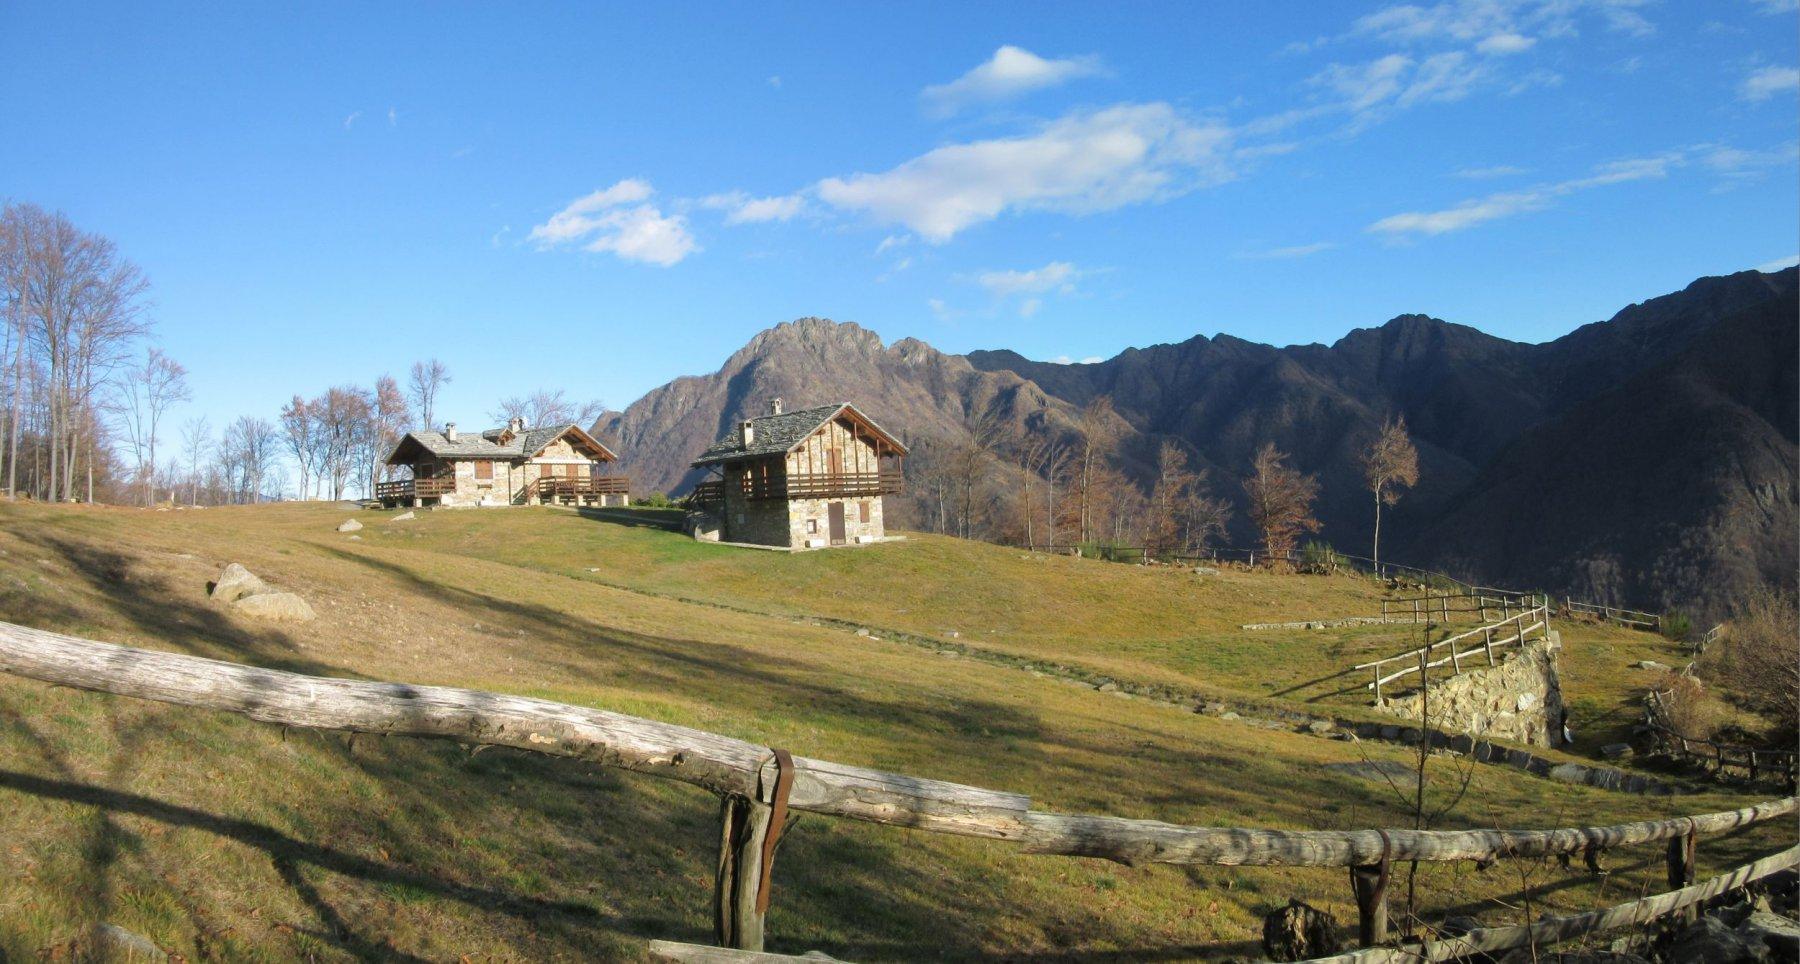 Alpe Piana di Biagio